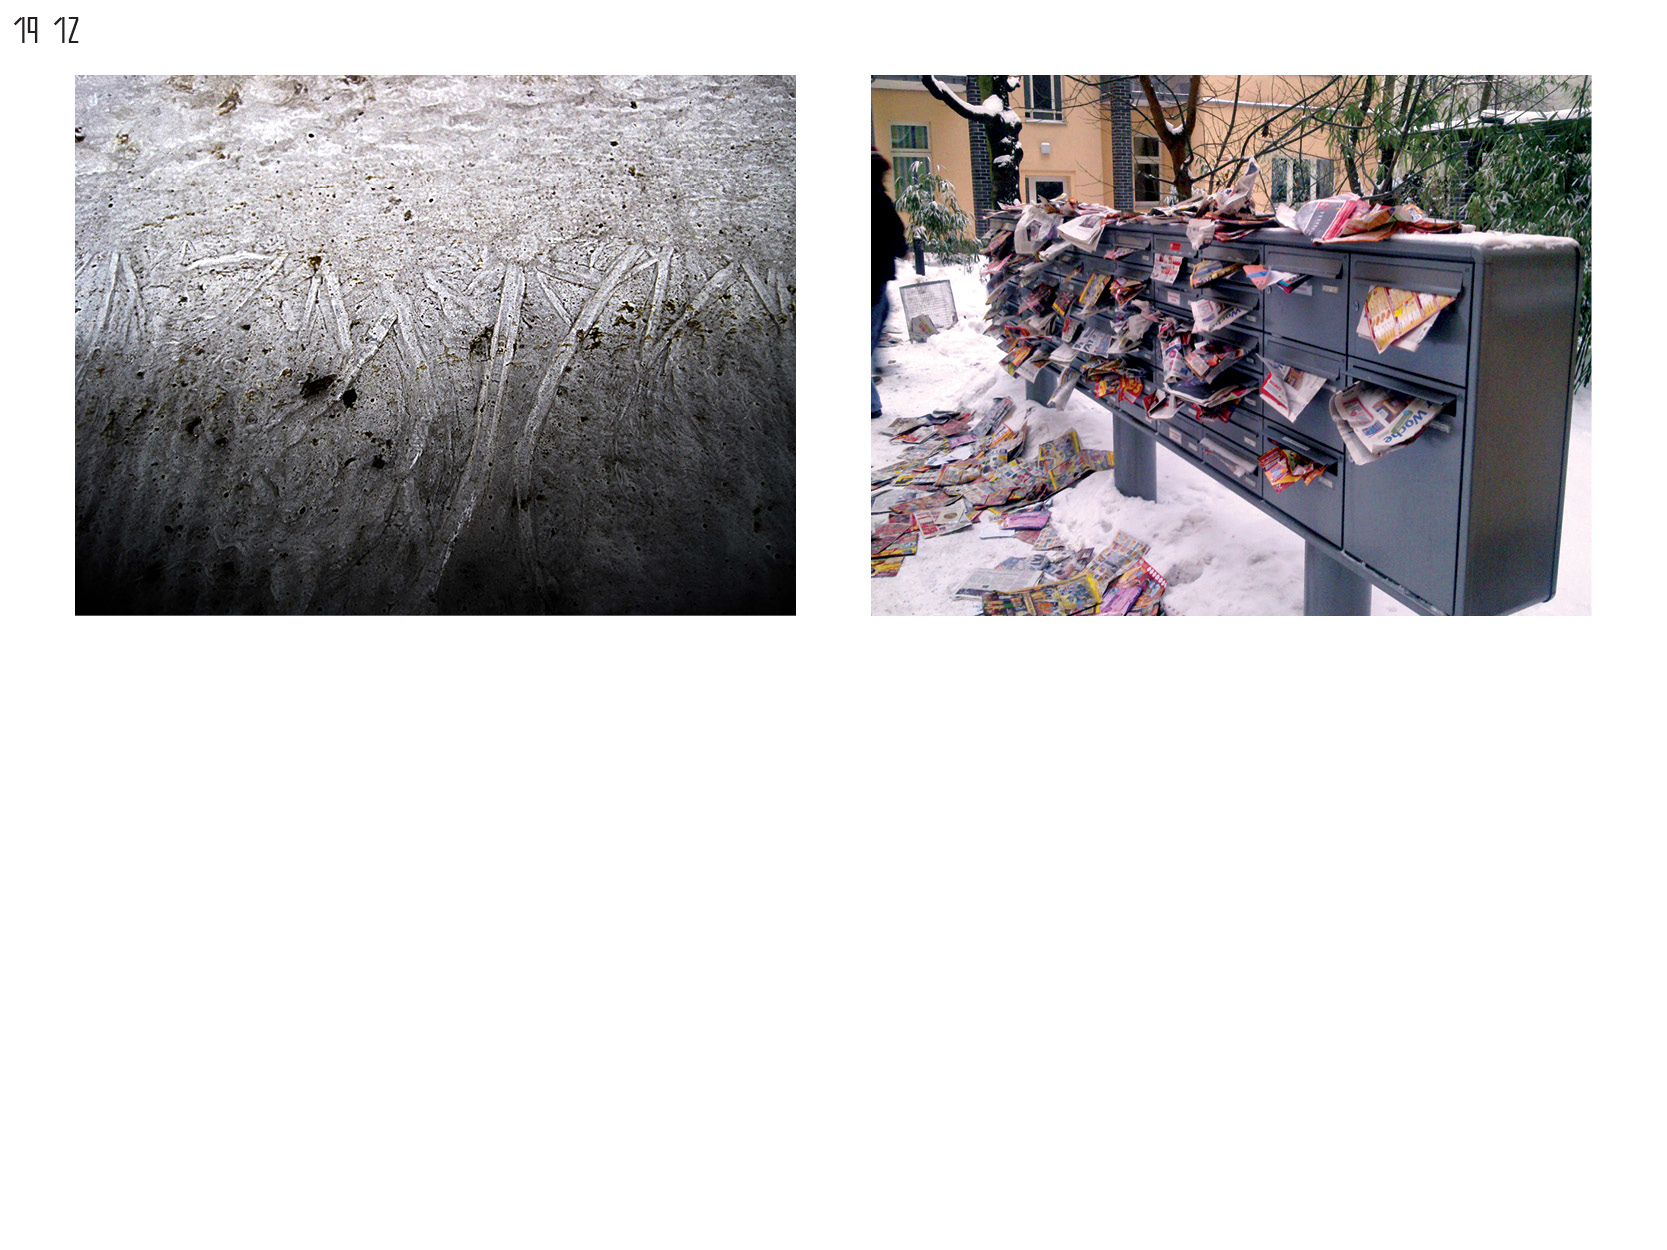 Gerrit-Schweiger-Dialog-Städte-Paris-Berlin-Jessica-Blank-Experiment-Fotoserie-Tagebuch-visuelle-Kommunikation-60